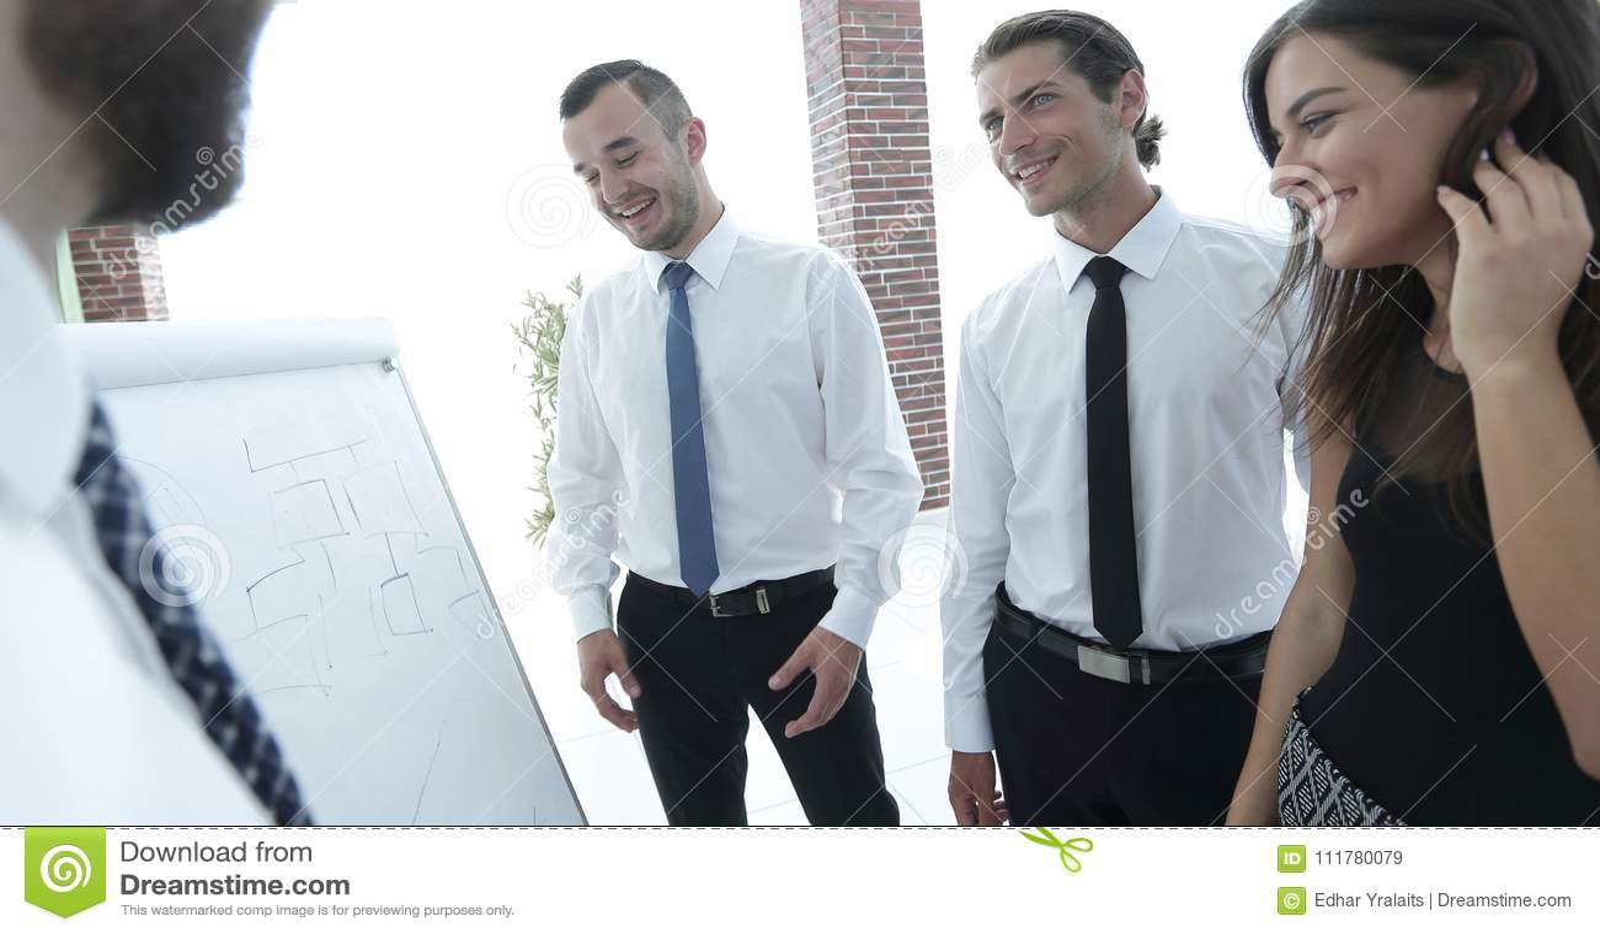 Businessman pointing business team on a blank flipchart.